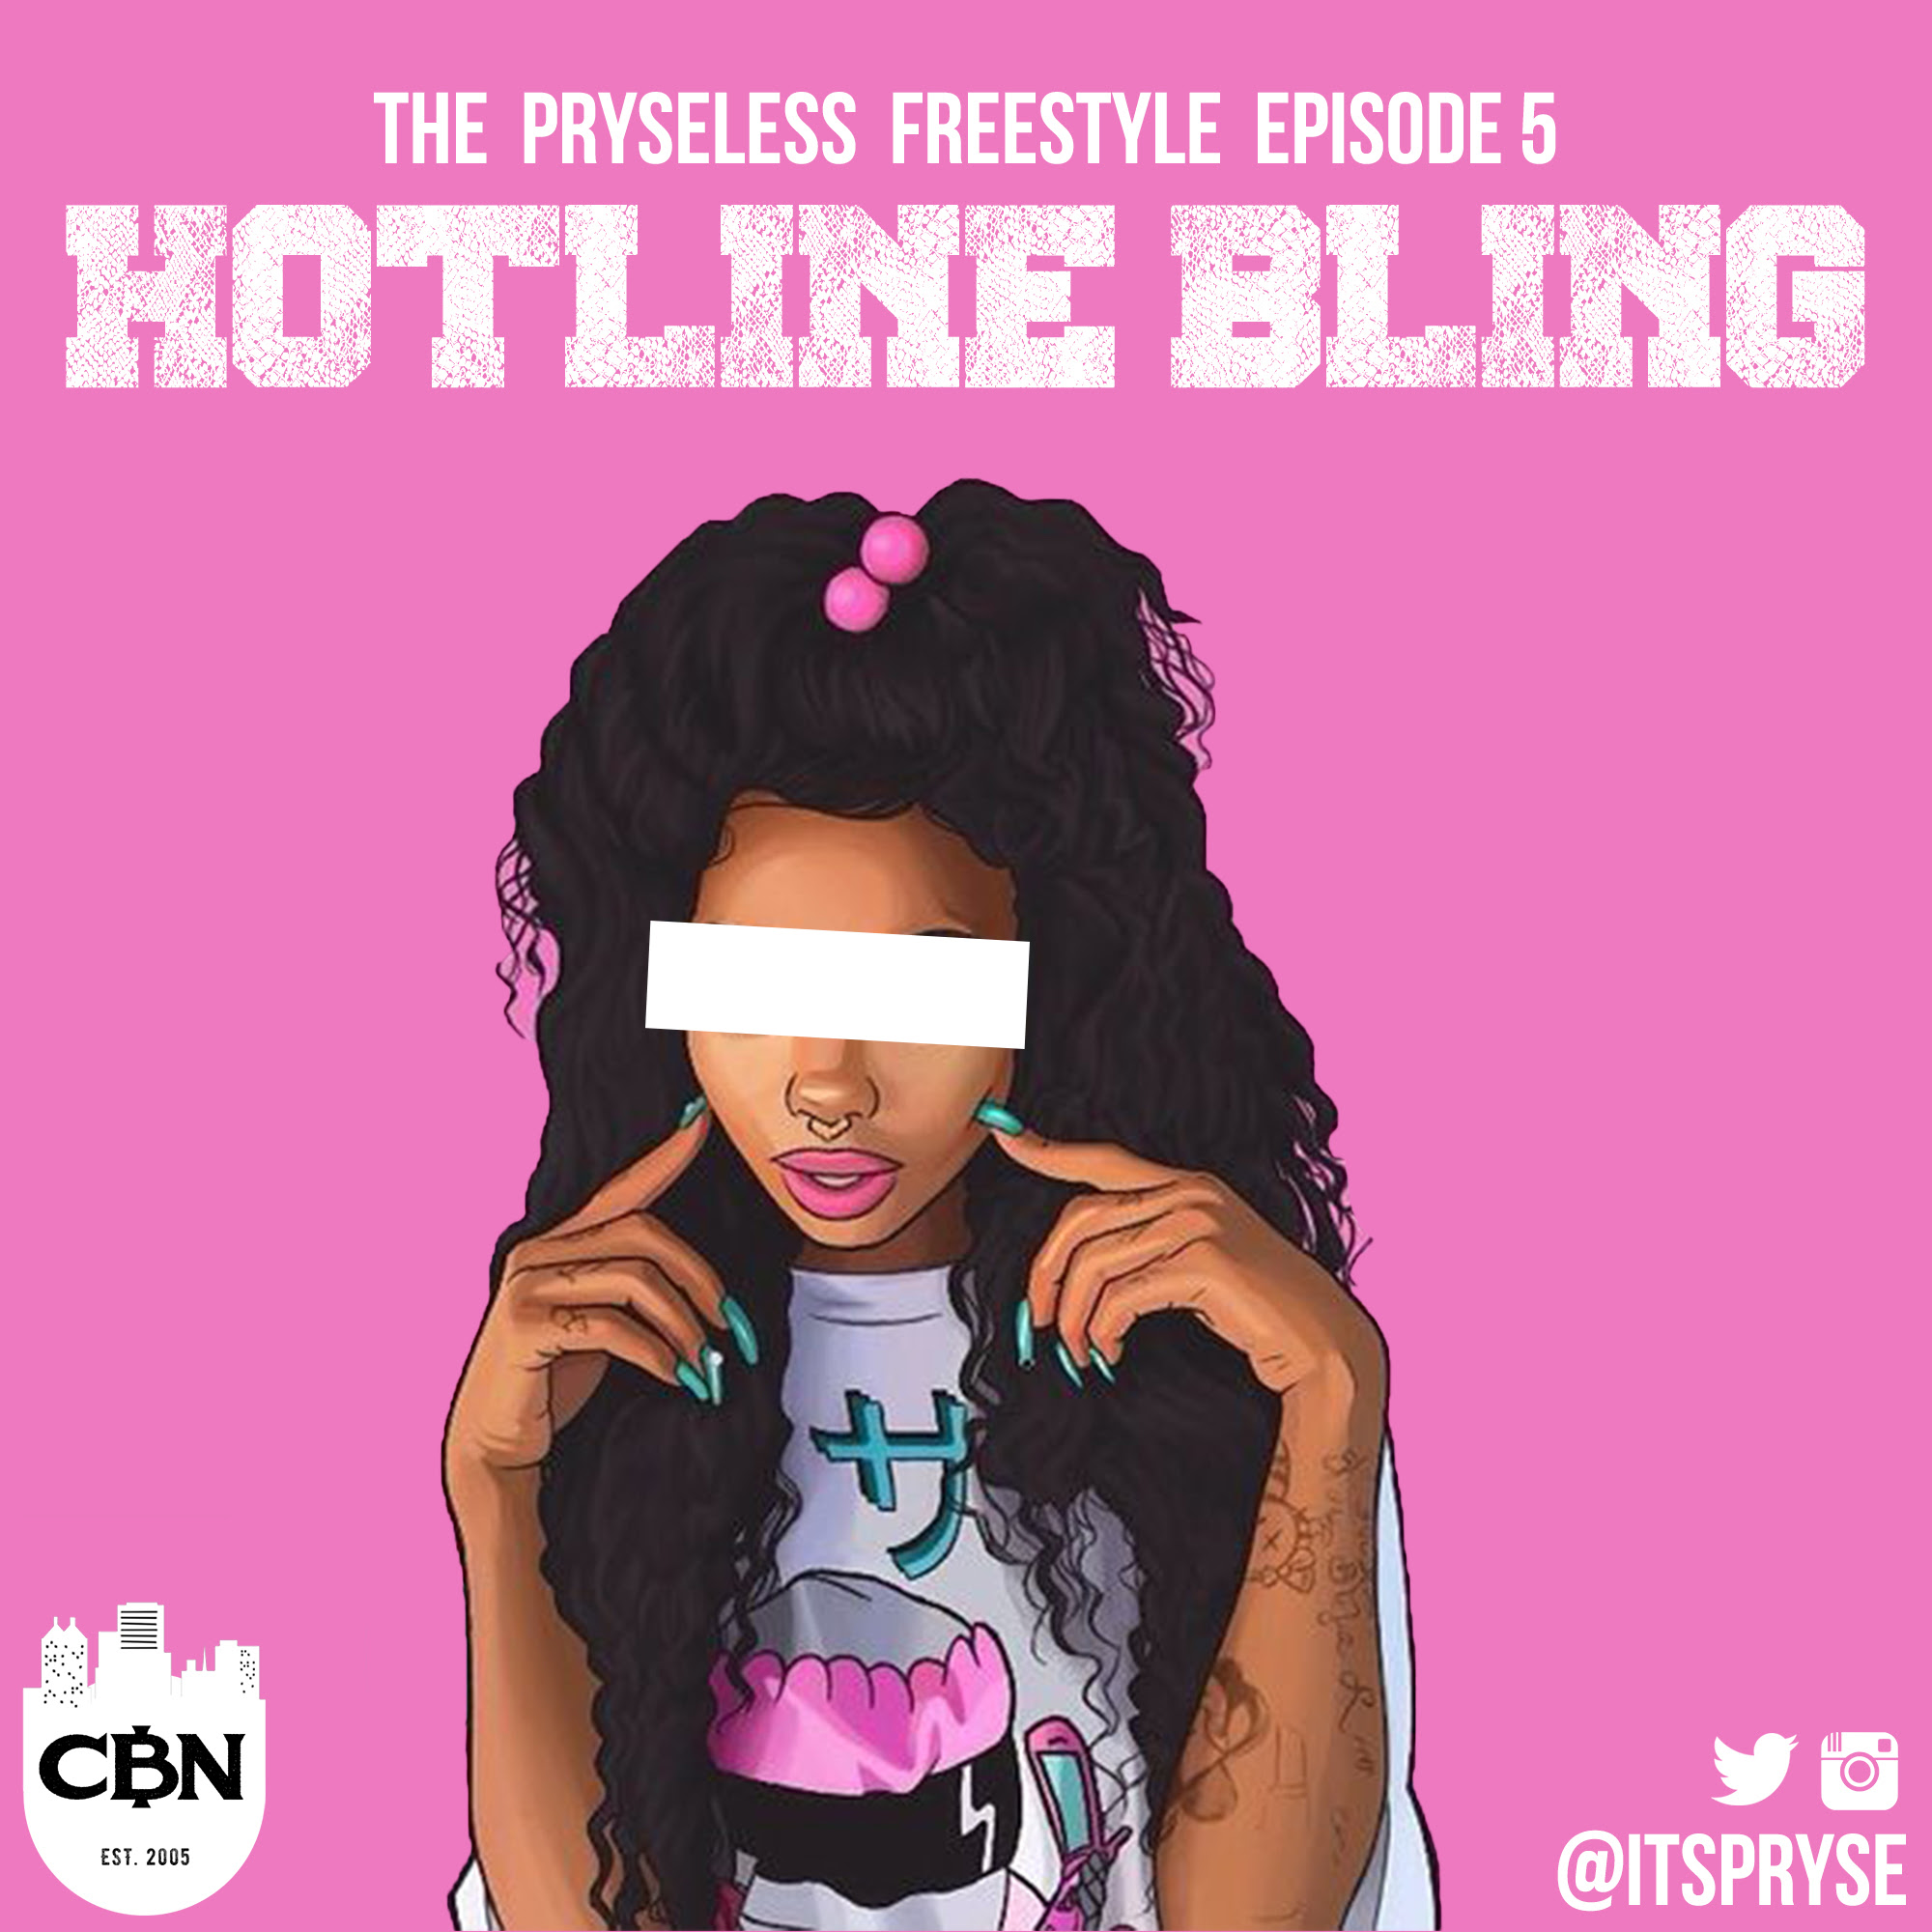 Pryse Hotling Bling